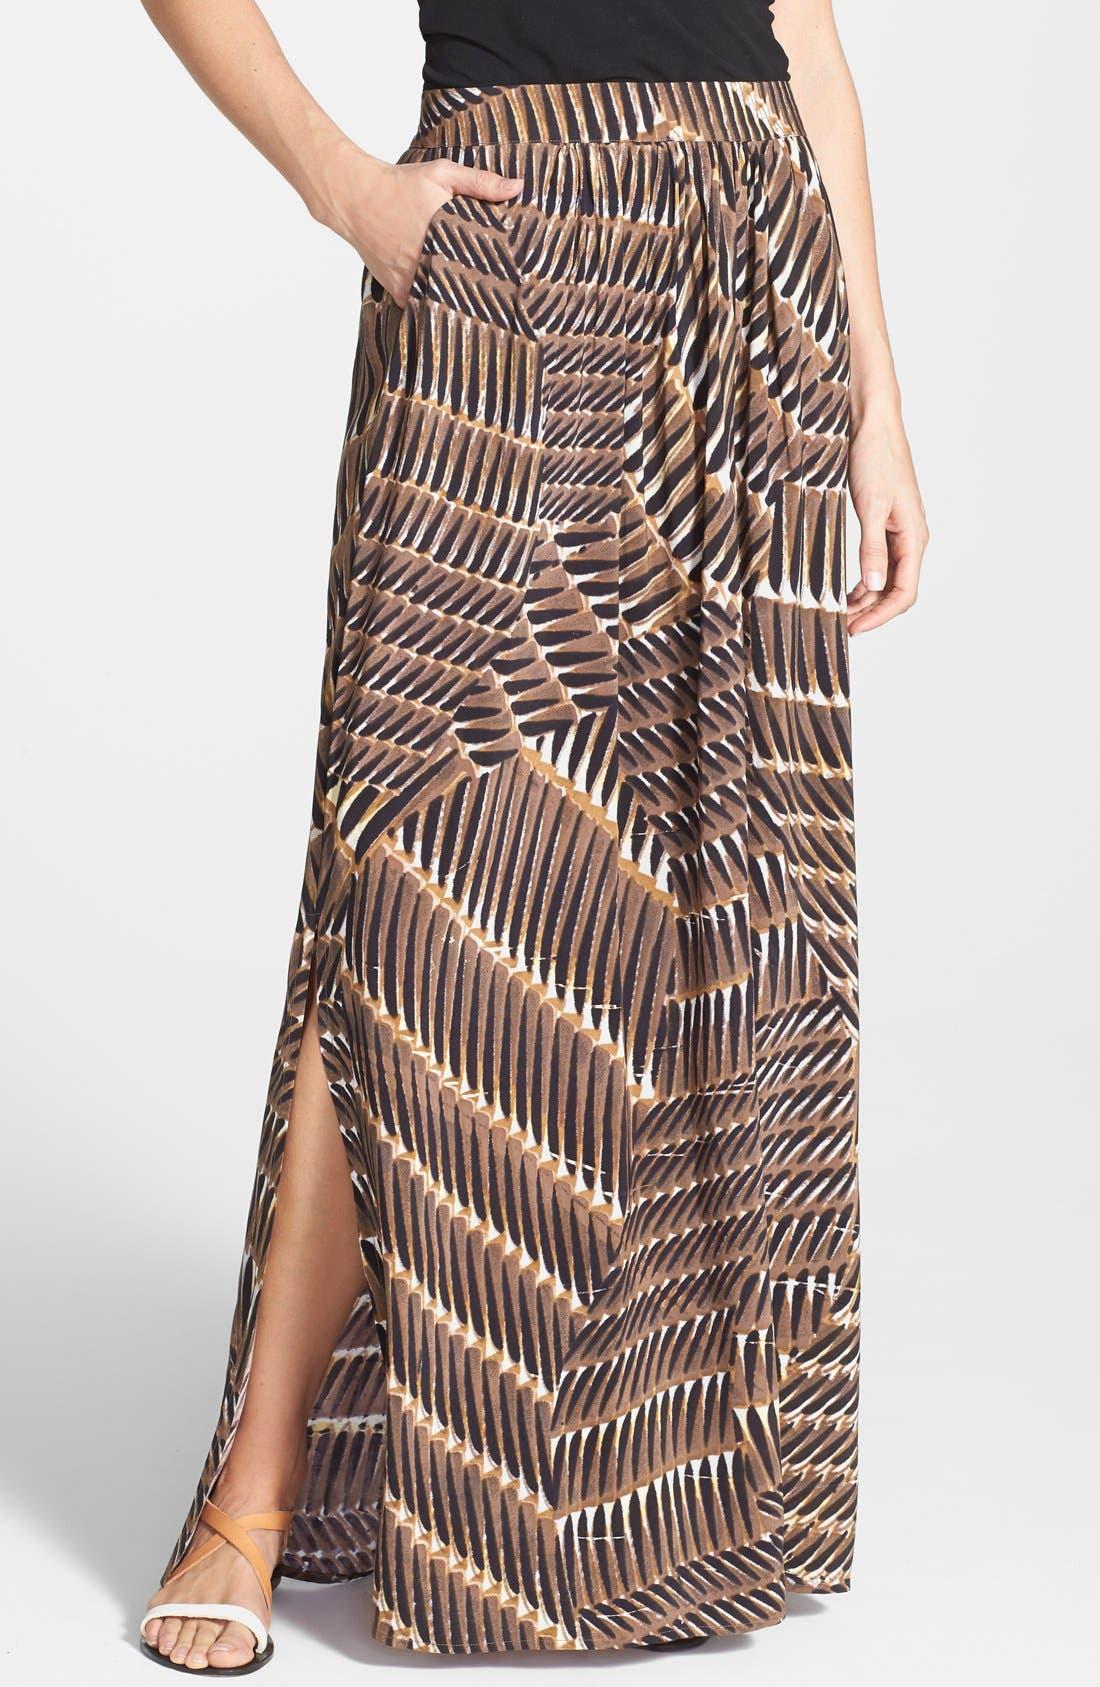 Alternate Image 1 Selected - NIC+ZOE 'Between the Lines' Maxi Skirt (Regular & Petite)